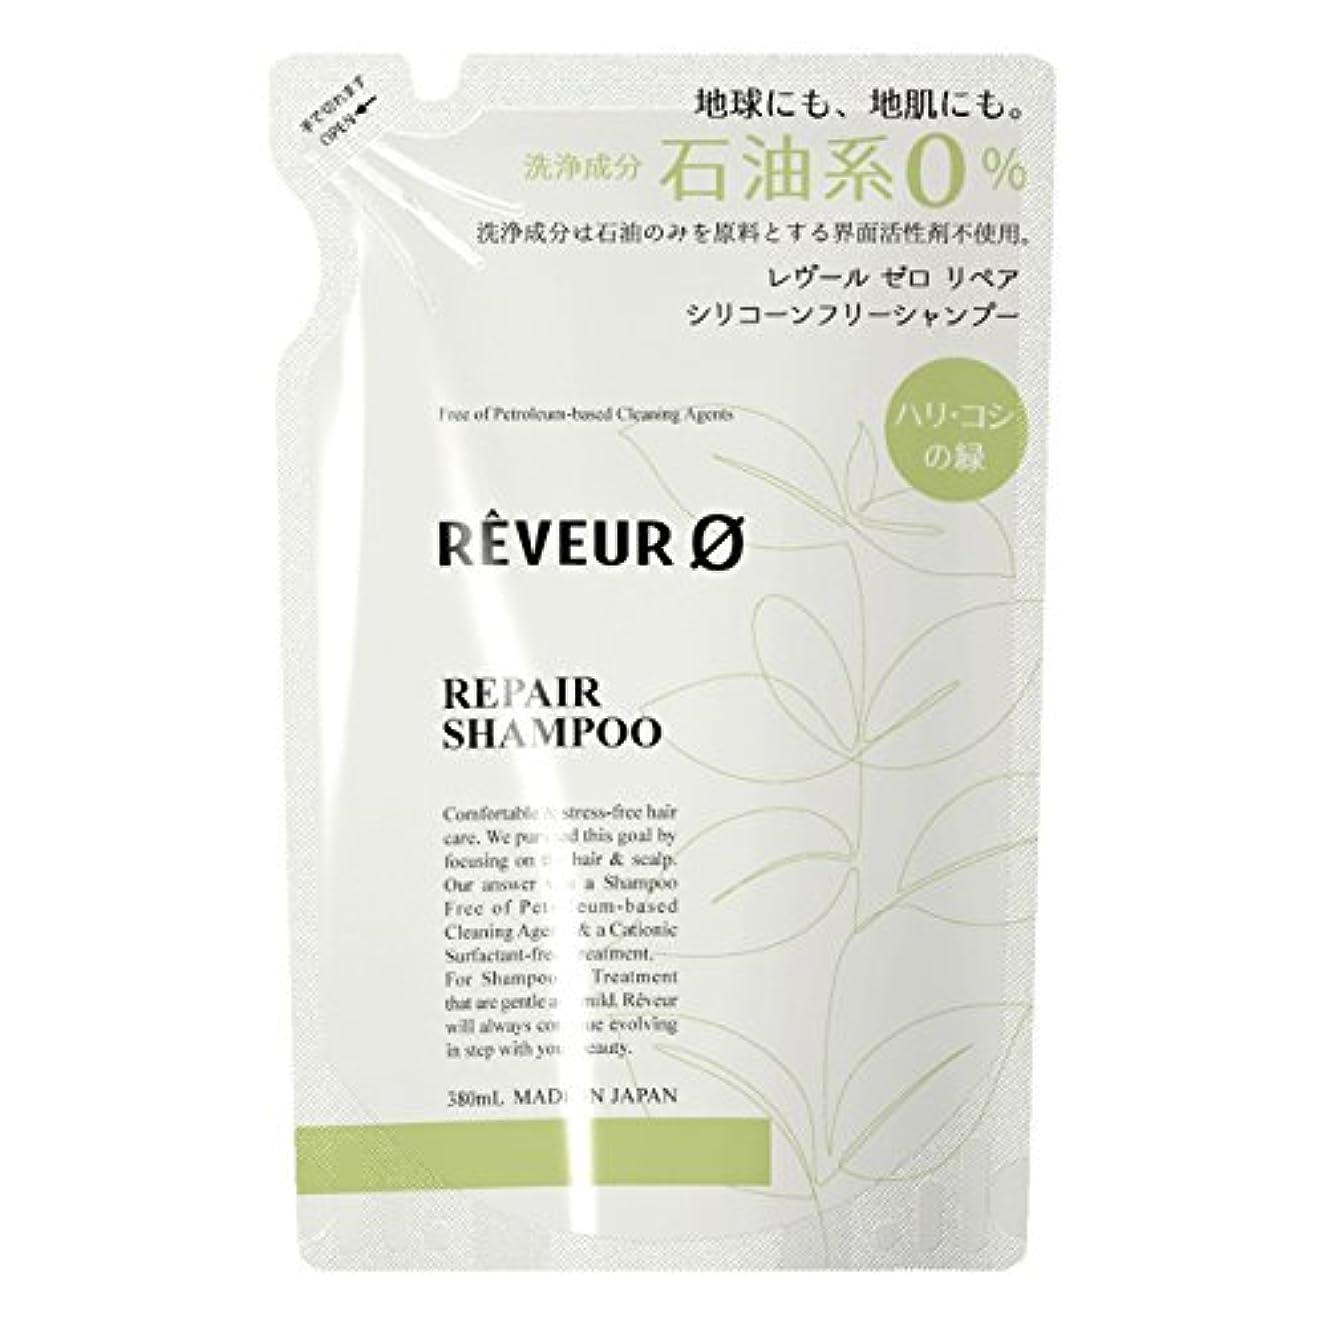 Reveur0(レヴール ゼロ) リペア シリコーンフリー シャンプー 〈詰替〉 (380mL)